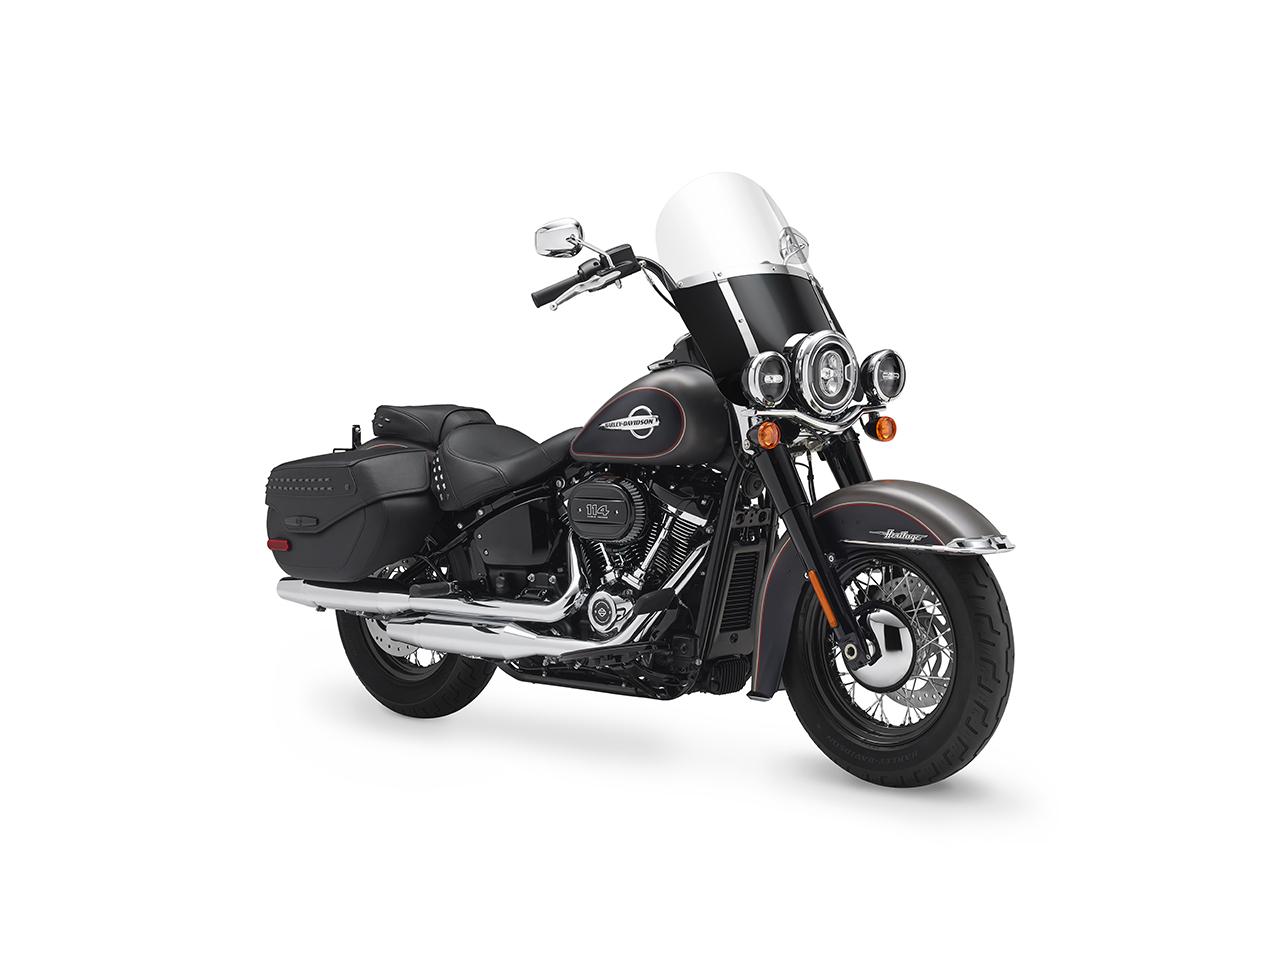 2018 Harley-Davidson Heritage Classic 114 Image